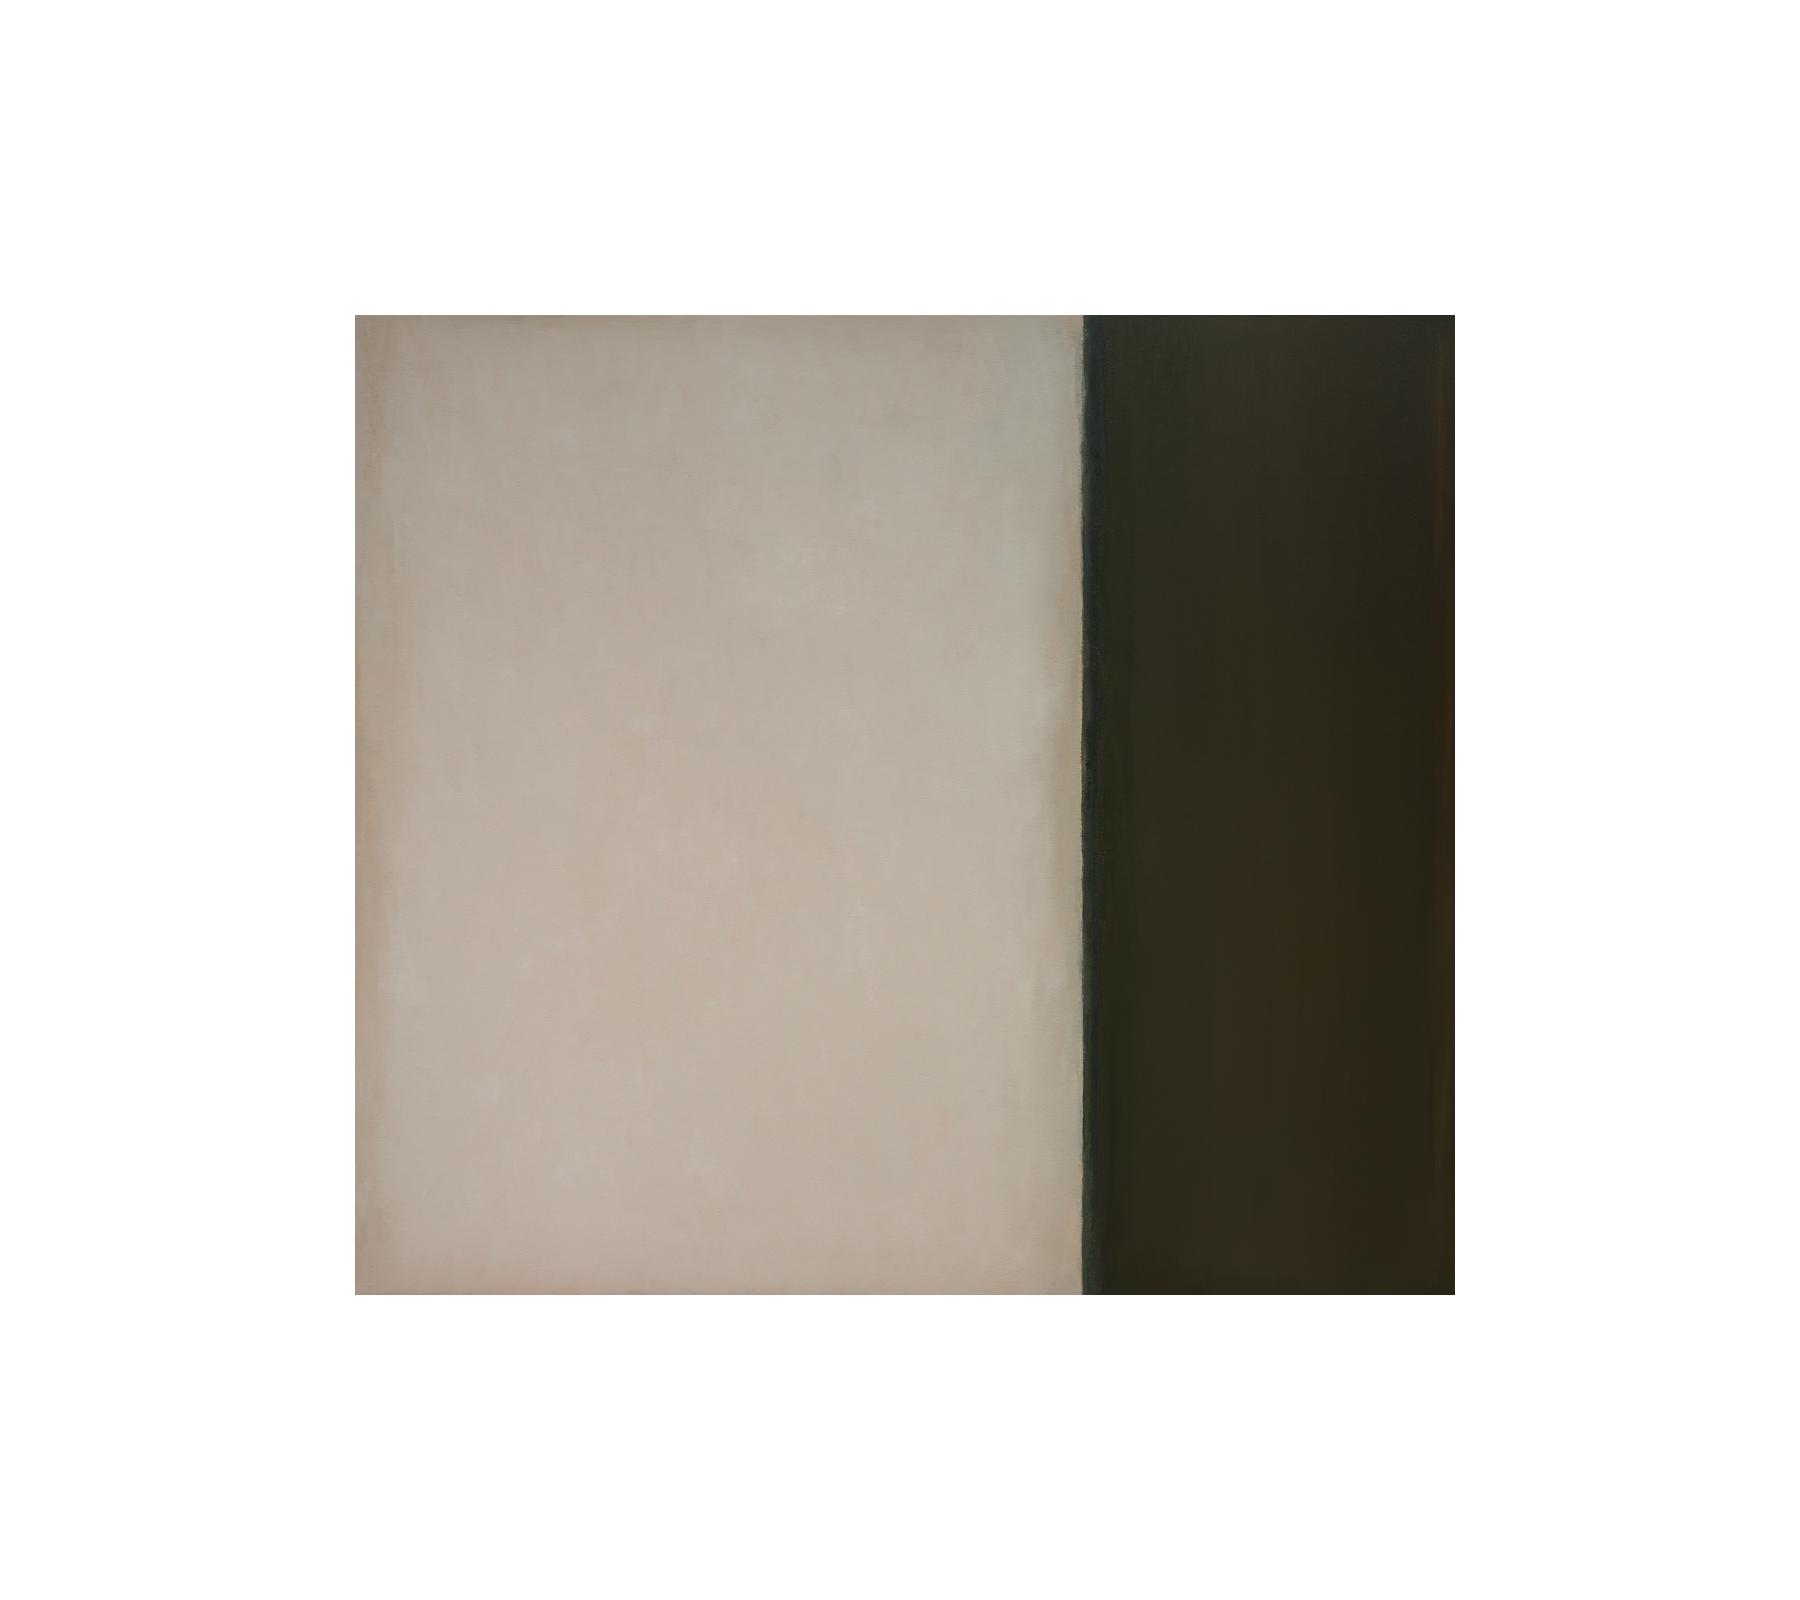 Untitled 2019 160x180cm